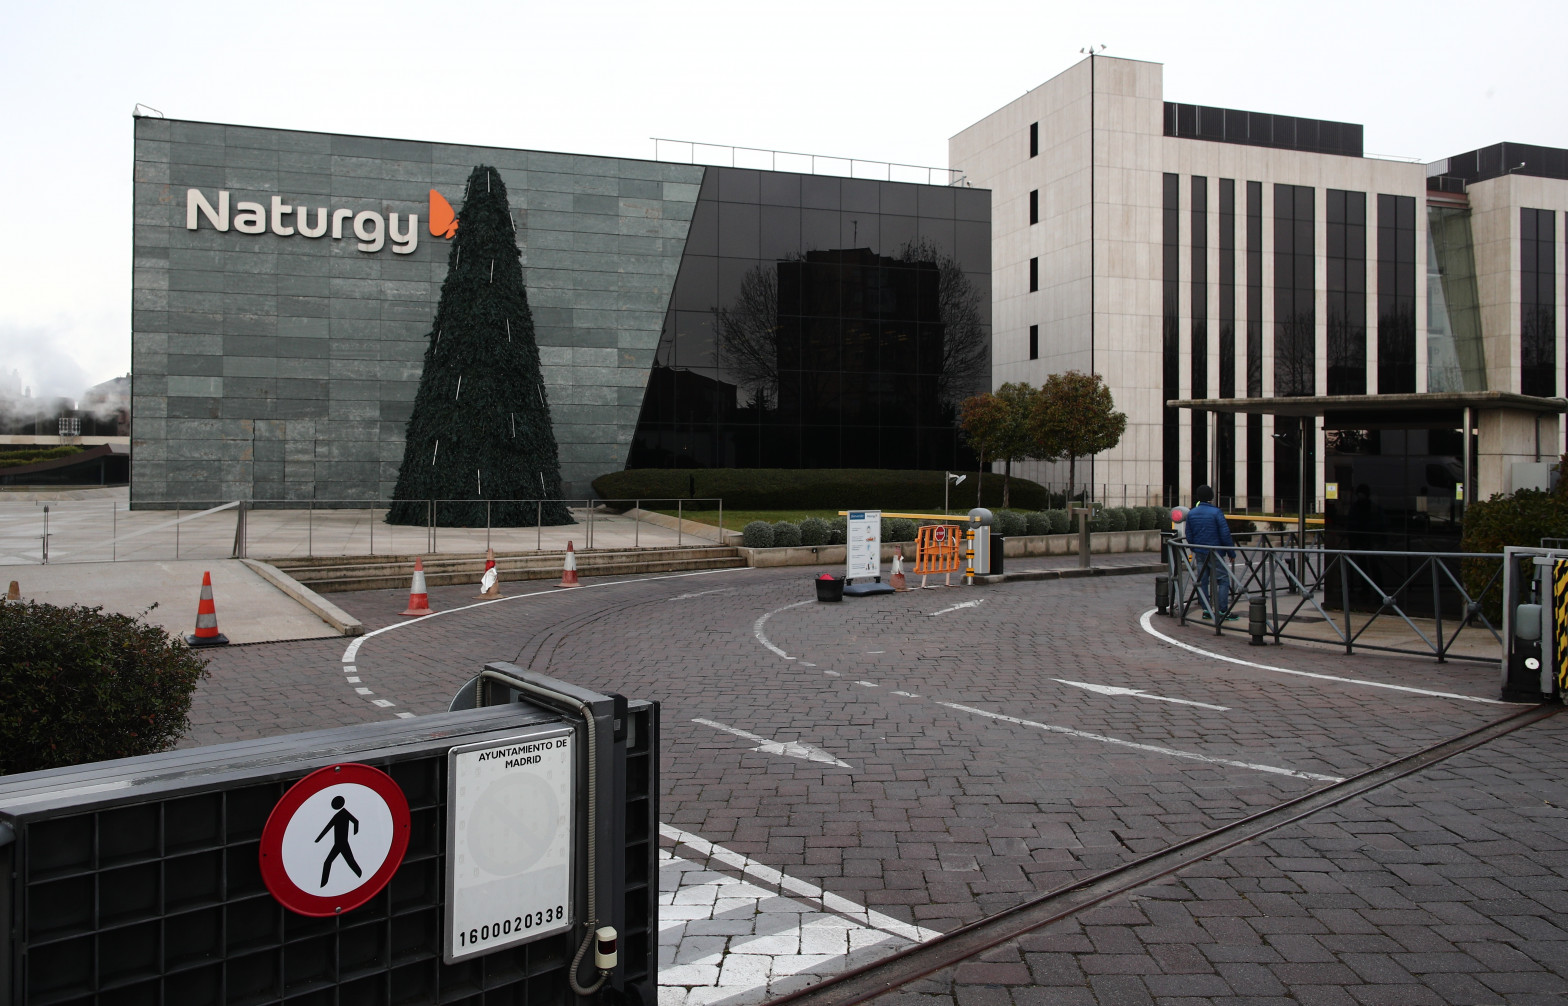 Oficina de Naturgy ubicada en la capital, Madrid, (España),